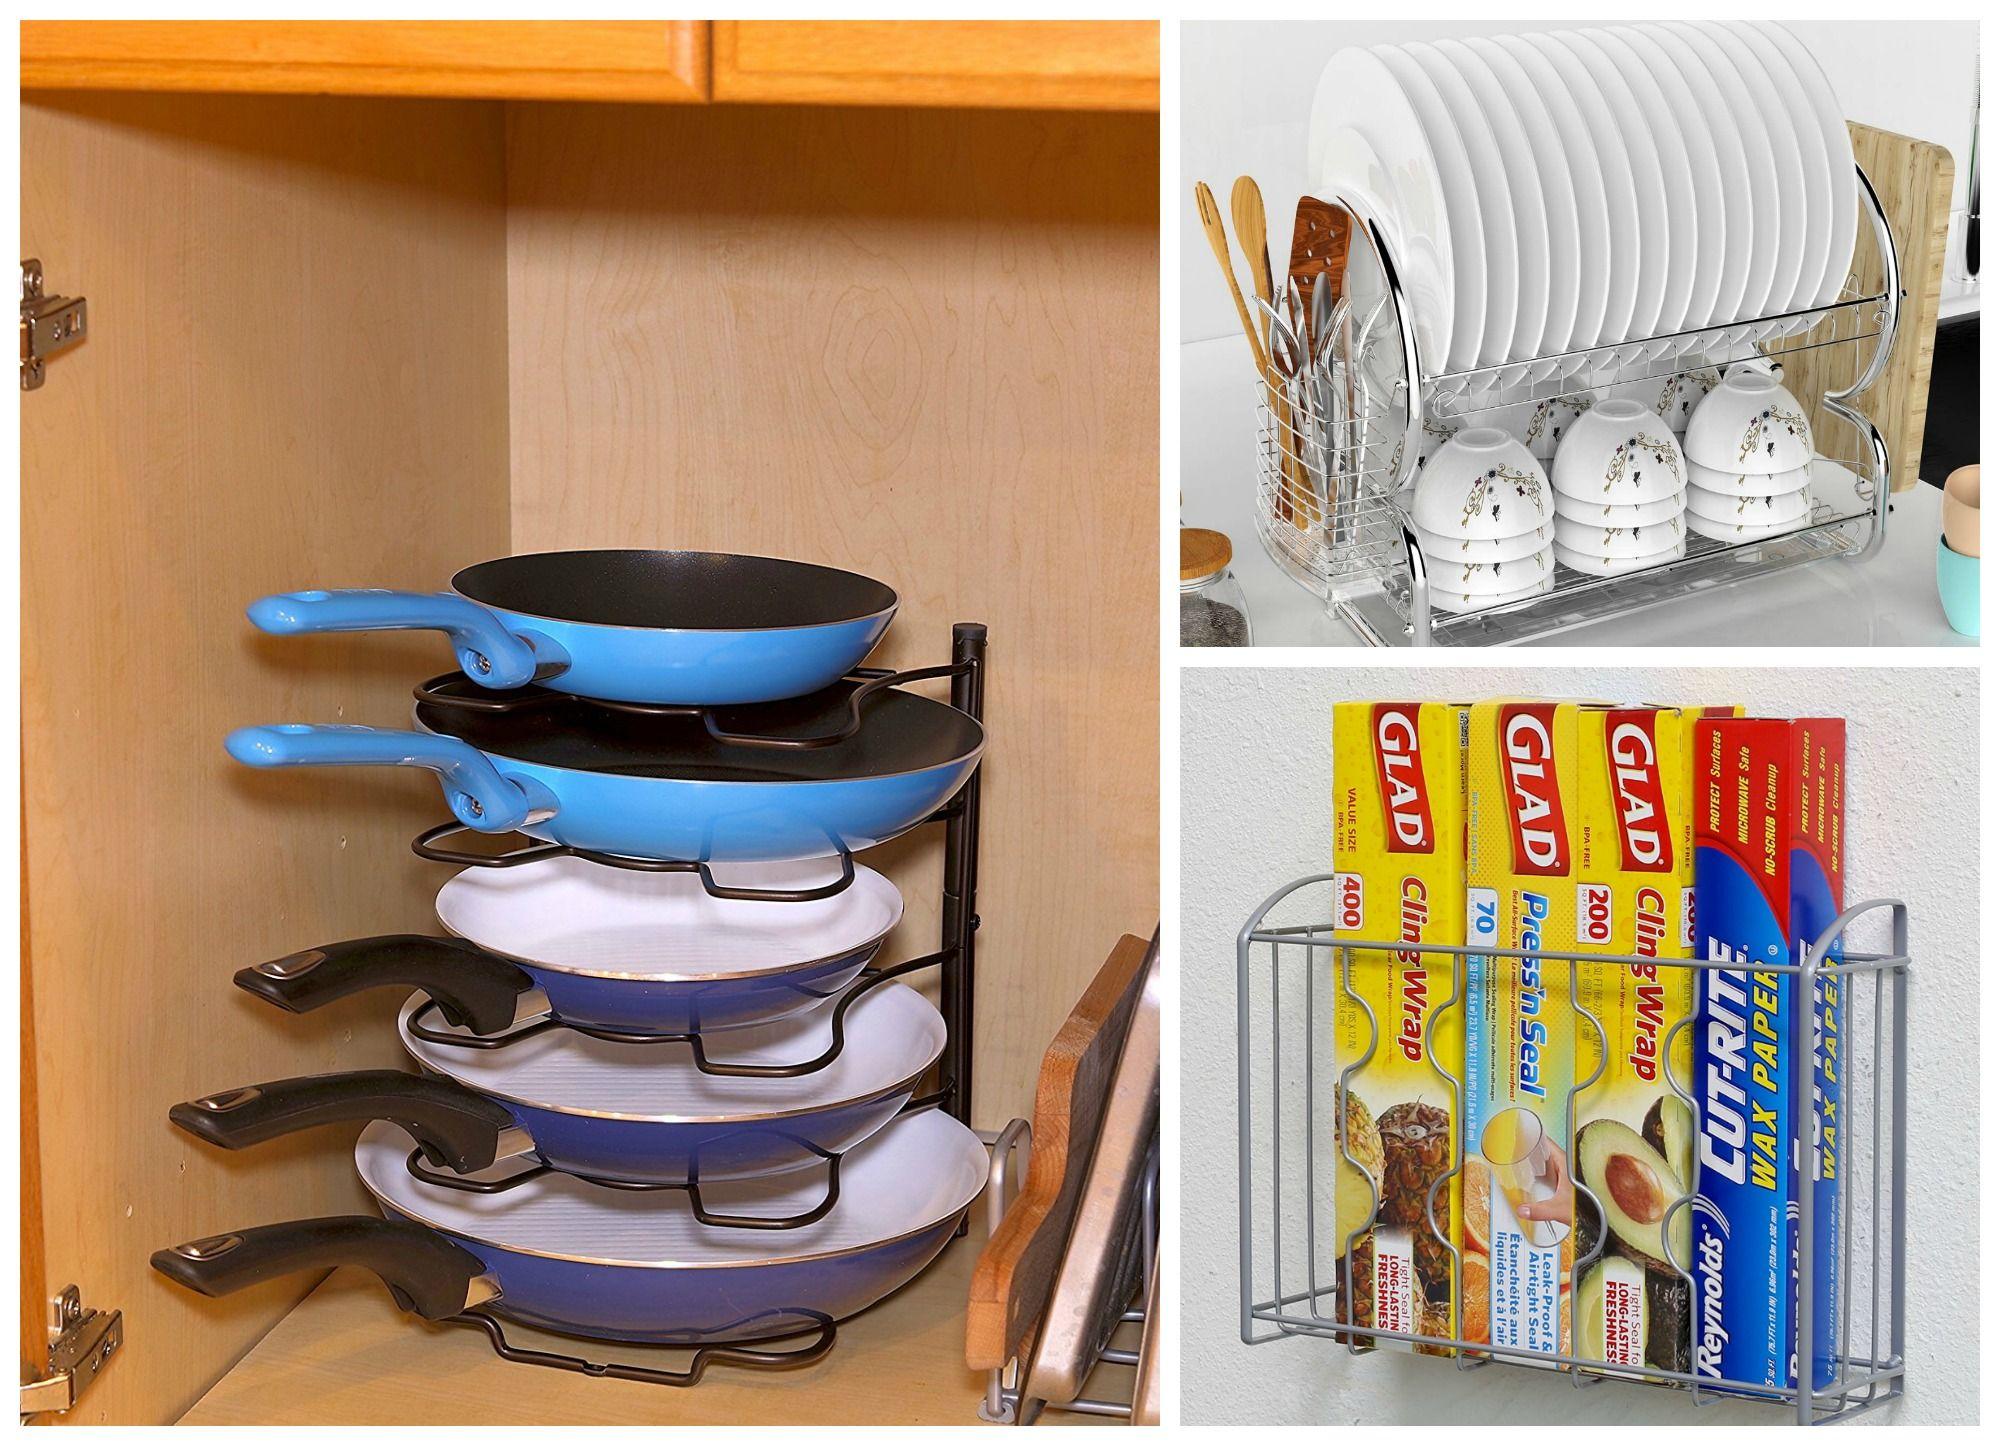 Amazon Kitchen Cabinets In 2020 Kitchen Cabinets Beautiful Kitchen Cabinets Cheap Kitchen Cabinets